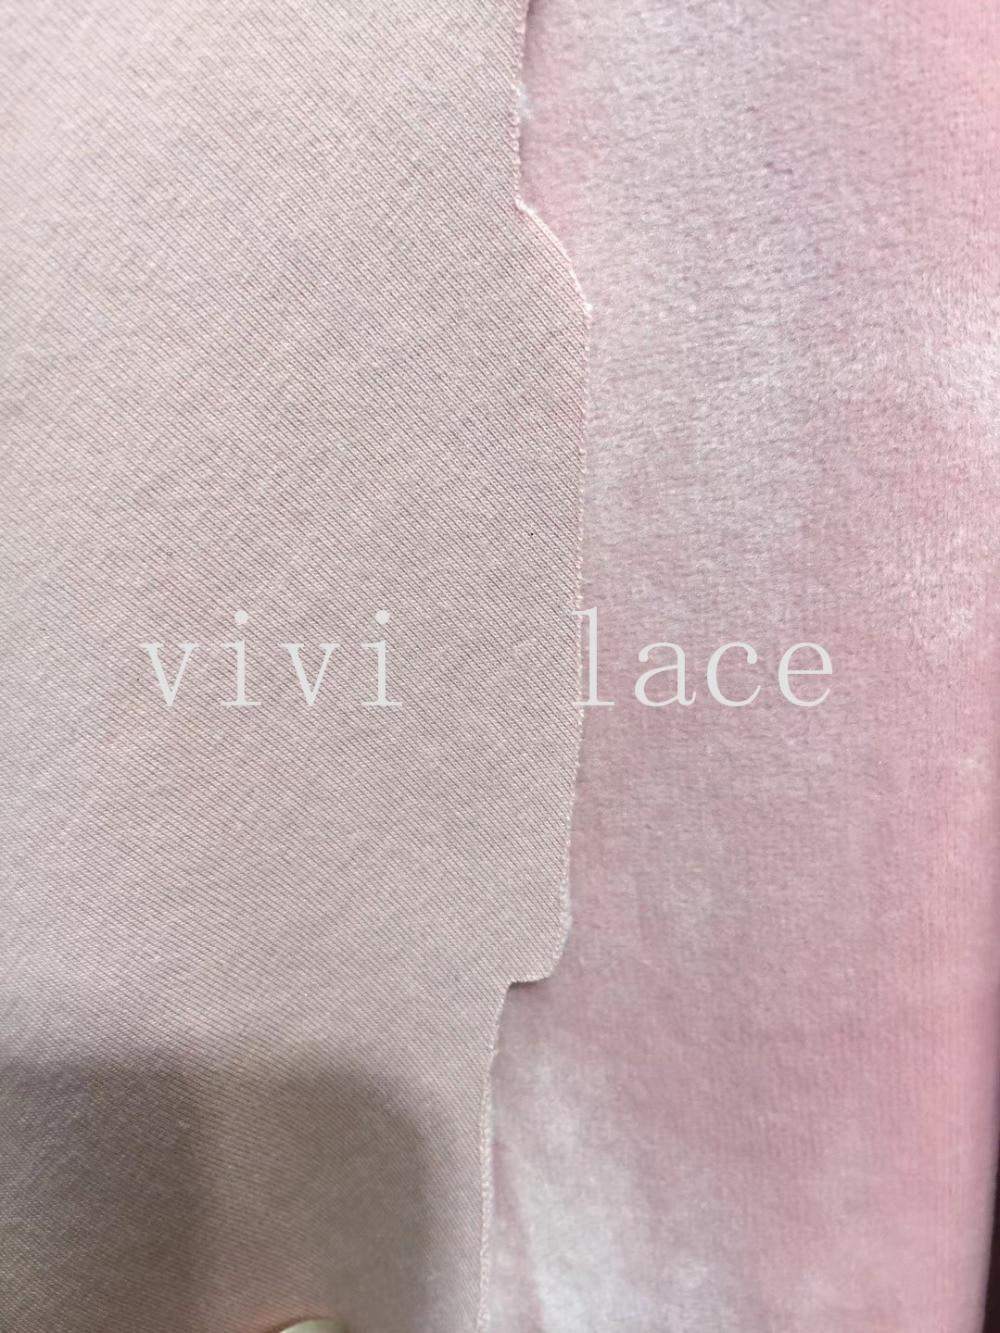 stock 5 yards xu002# <font><b>pink</b></font> <font><b>mink</b></font> velvet bonded with odell cotton 2 layer luxury winter <font><b>dress</b></font> lace for bridal wedding <font><b>dress</b></font>